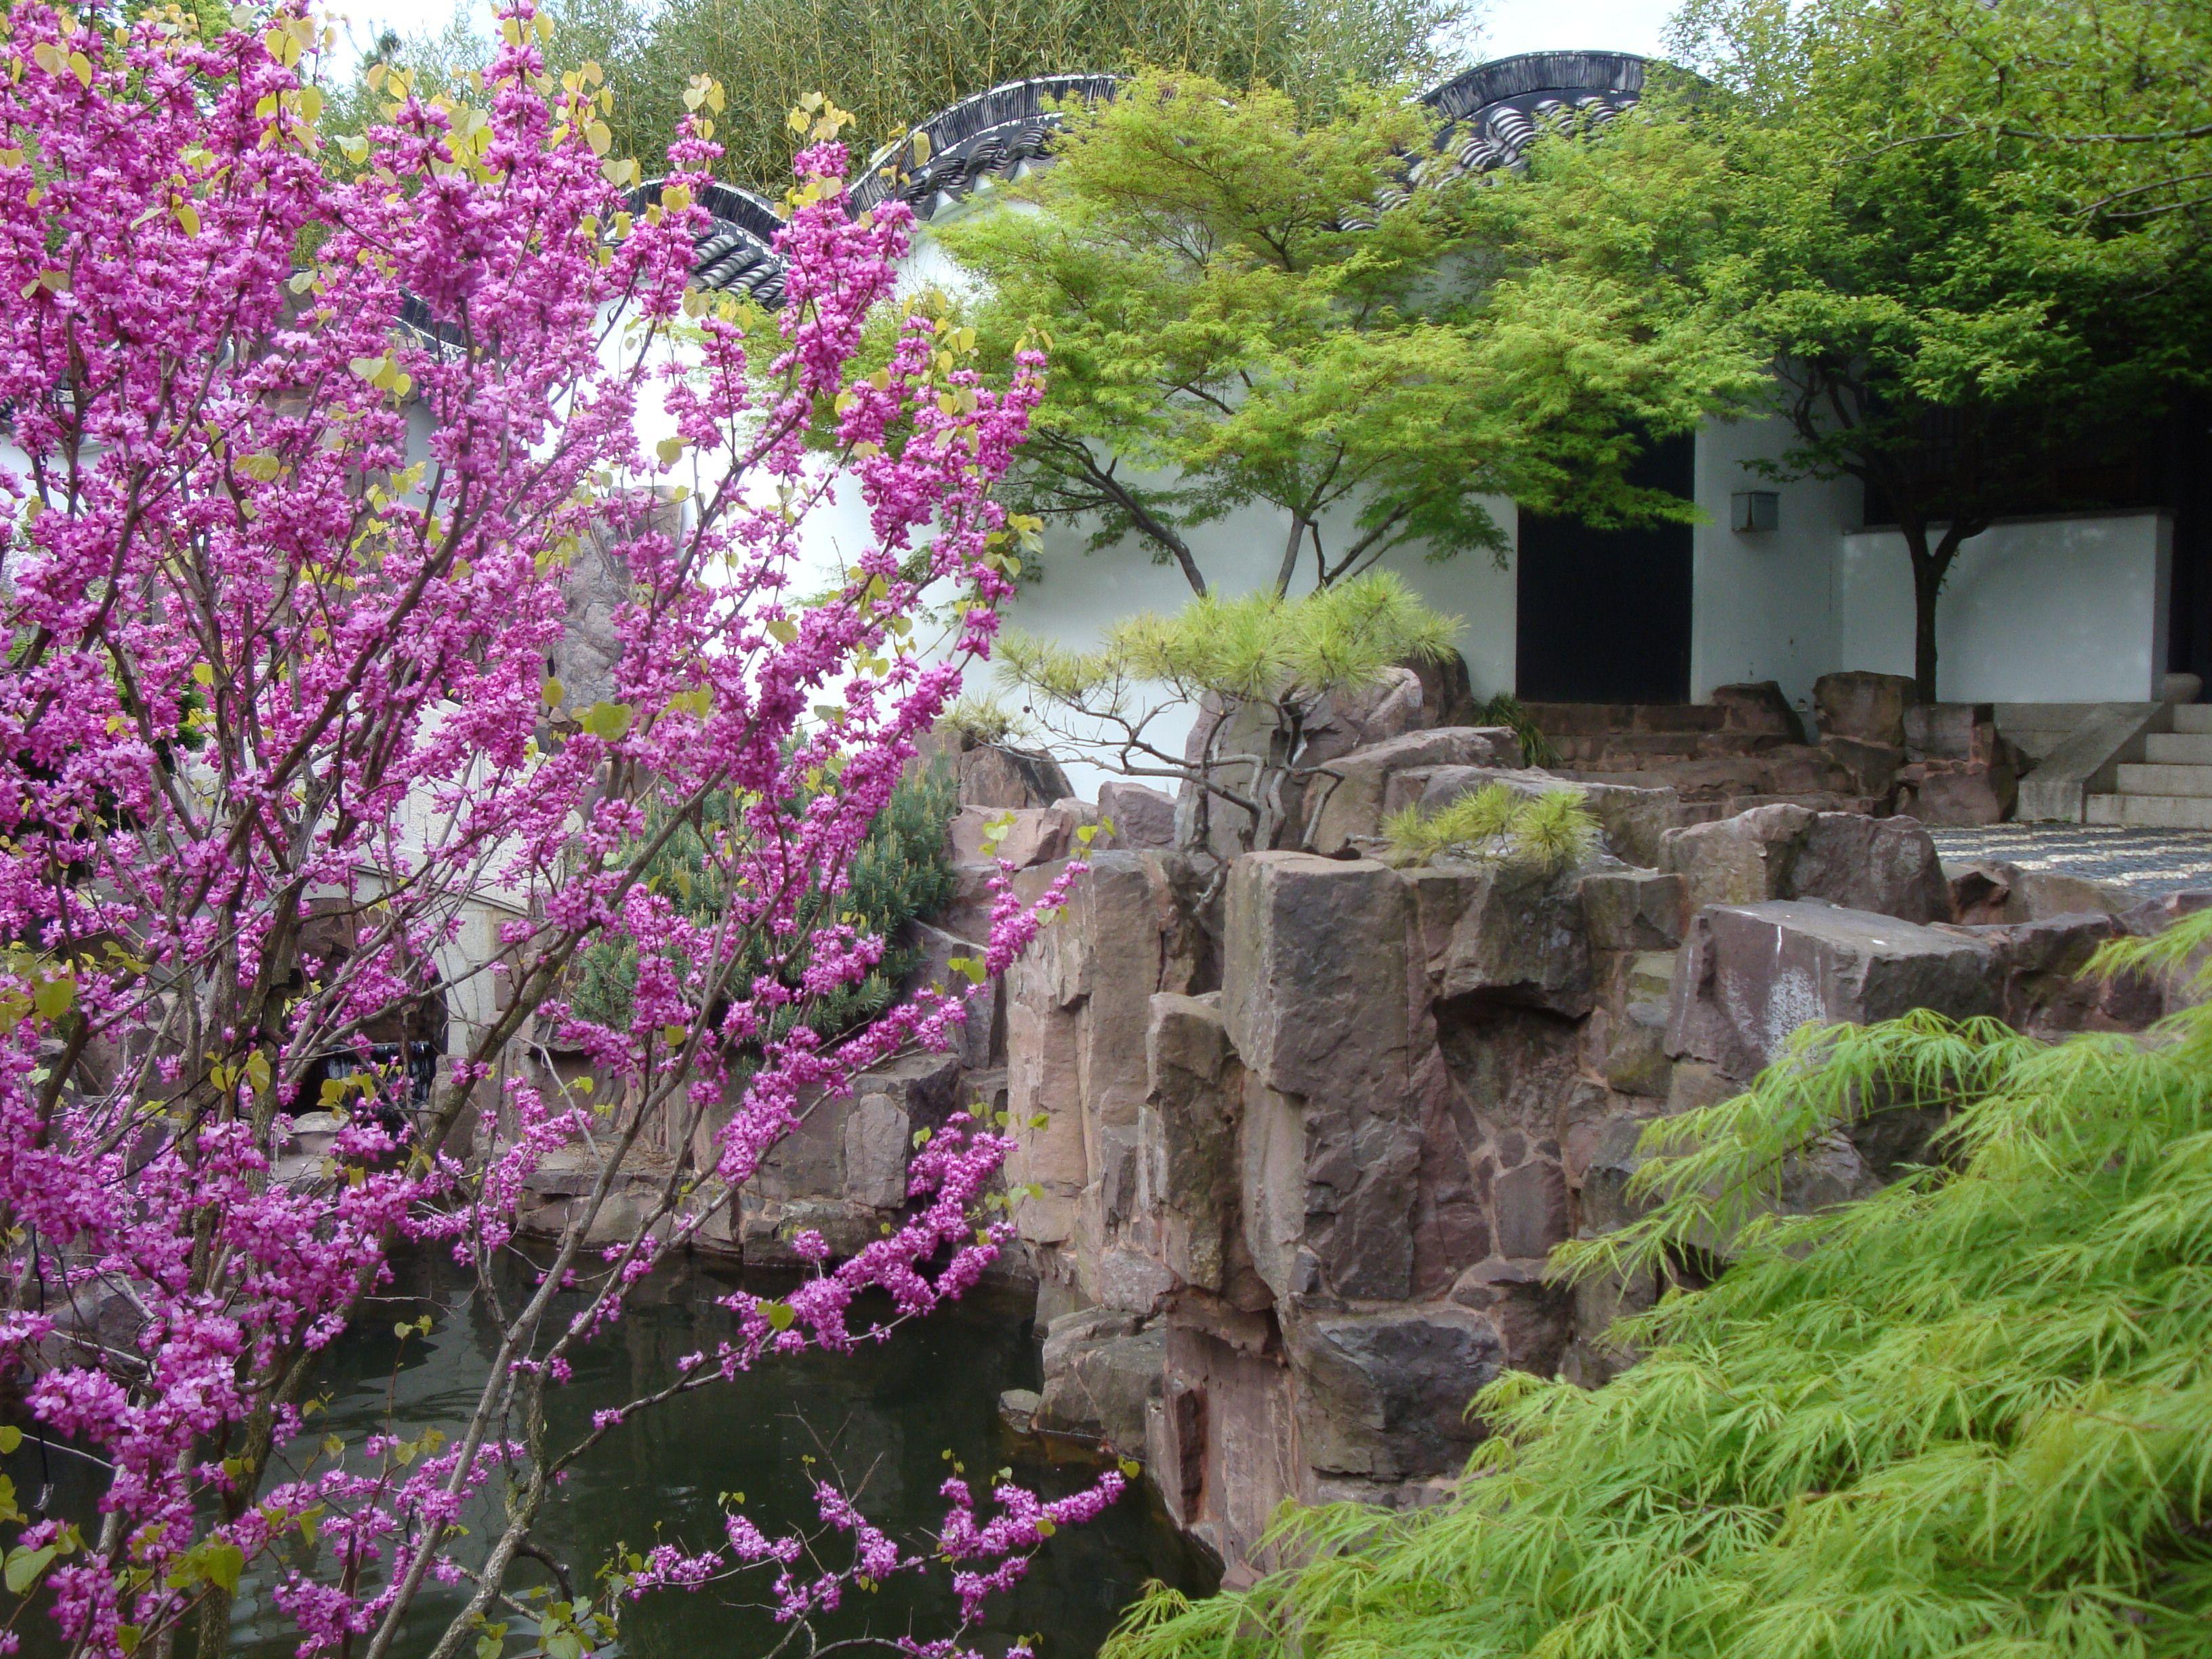 Snug Harbor Botanical Garden, Staten Island, NY